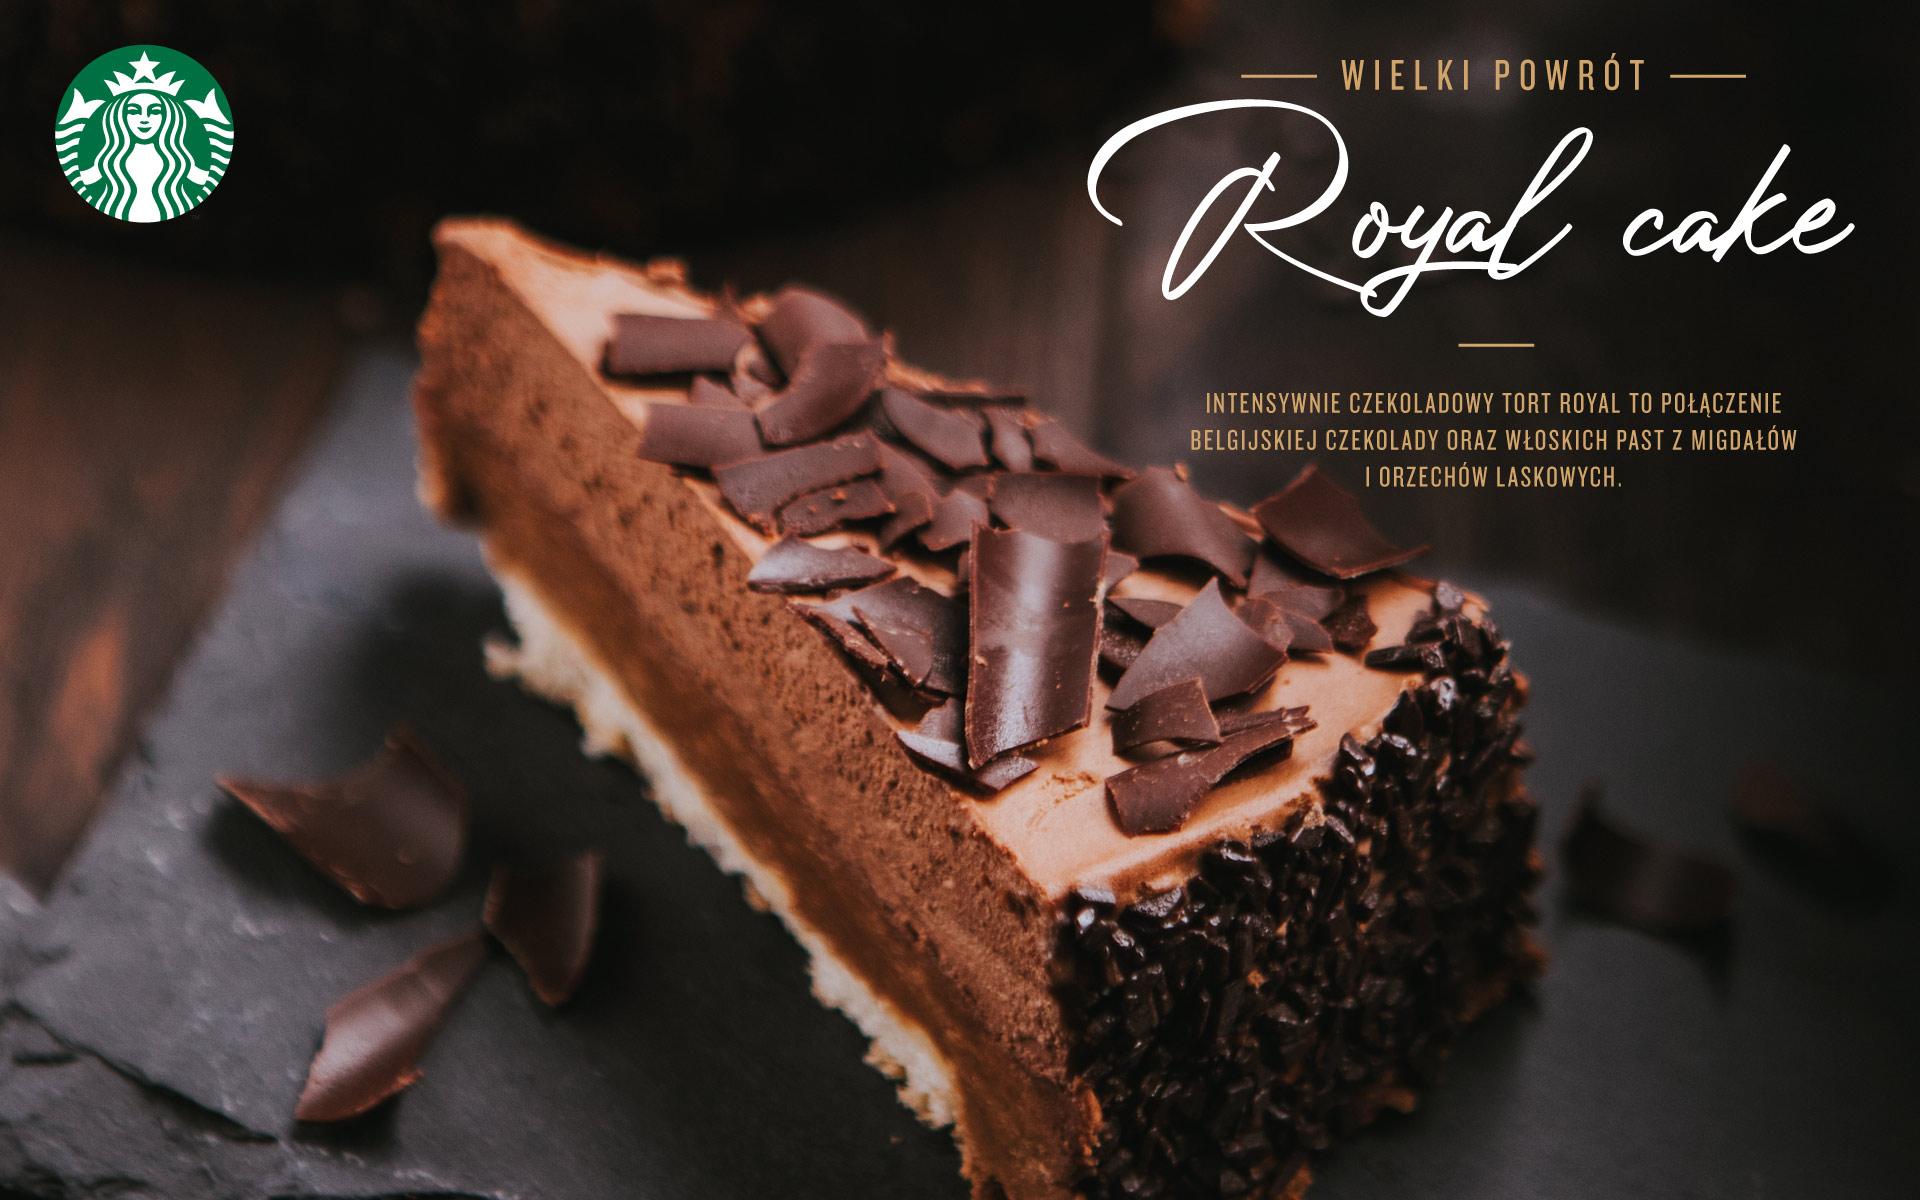 Starbucks Royal cake